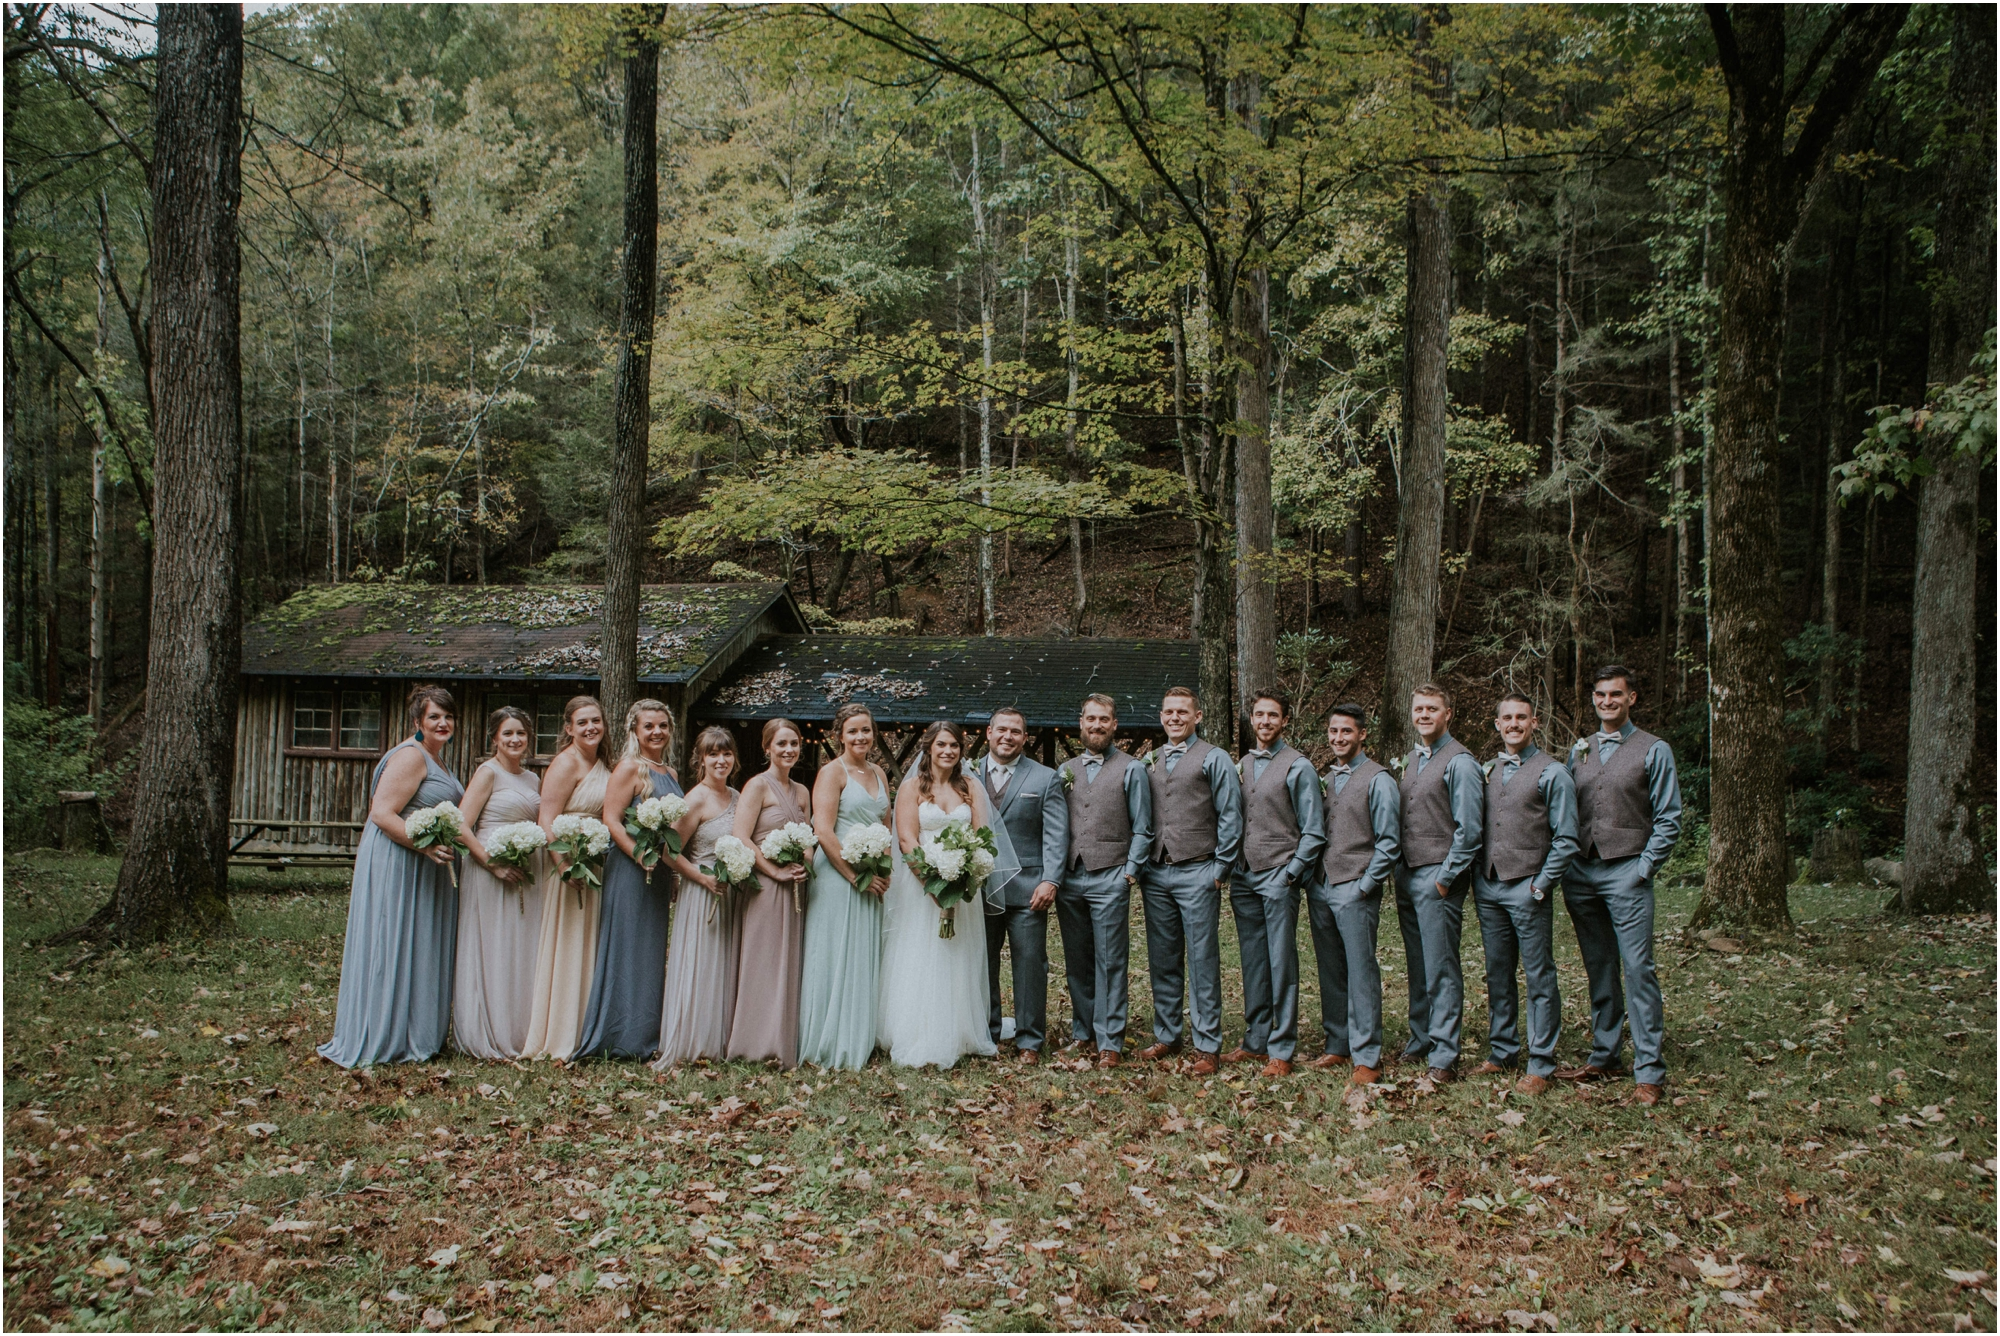 camp-at-buffalo-mountain-jonesborough-tennessee-rustic-wedding-elopement-fall-johnsoncity-northeast-tn_0110.jpg